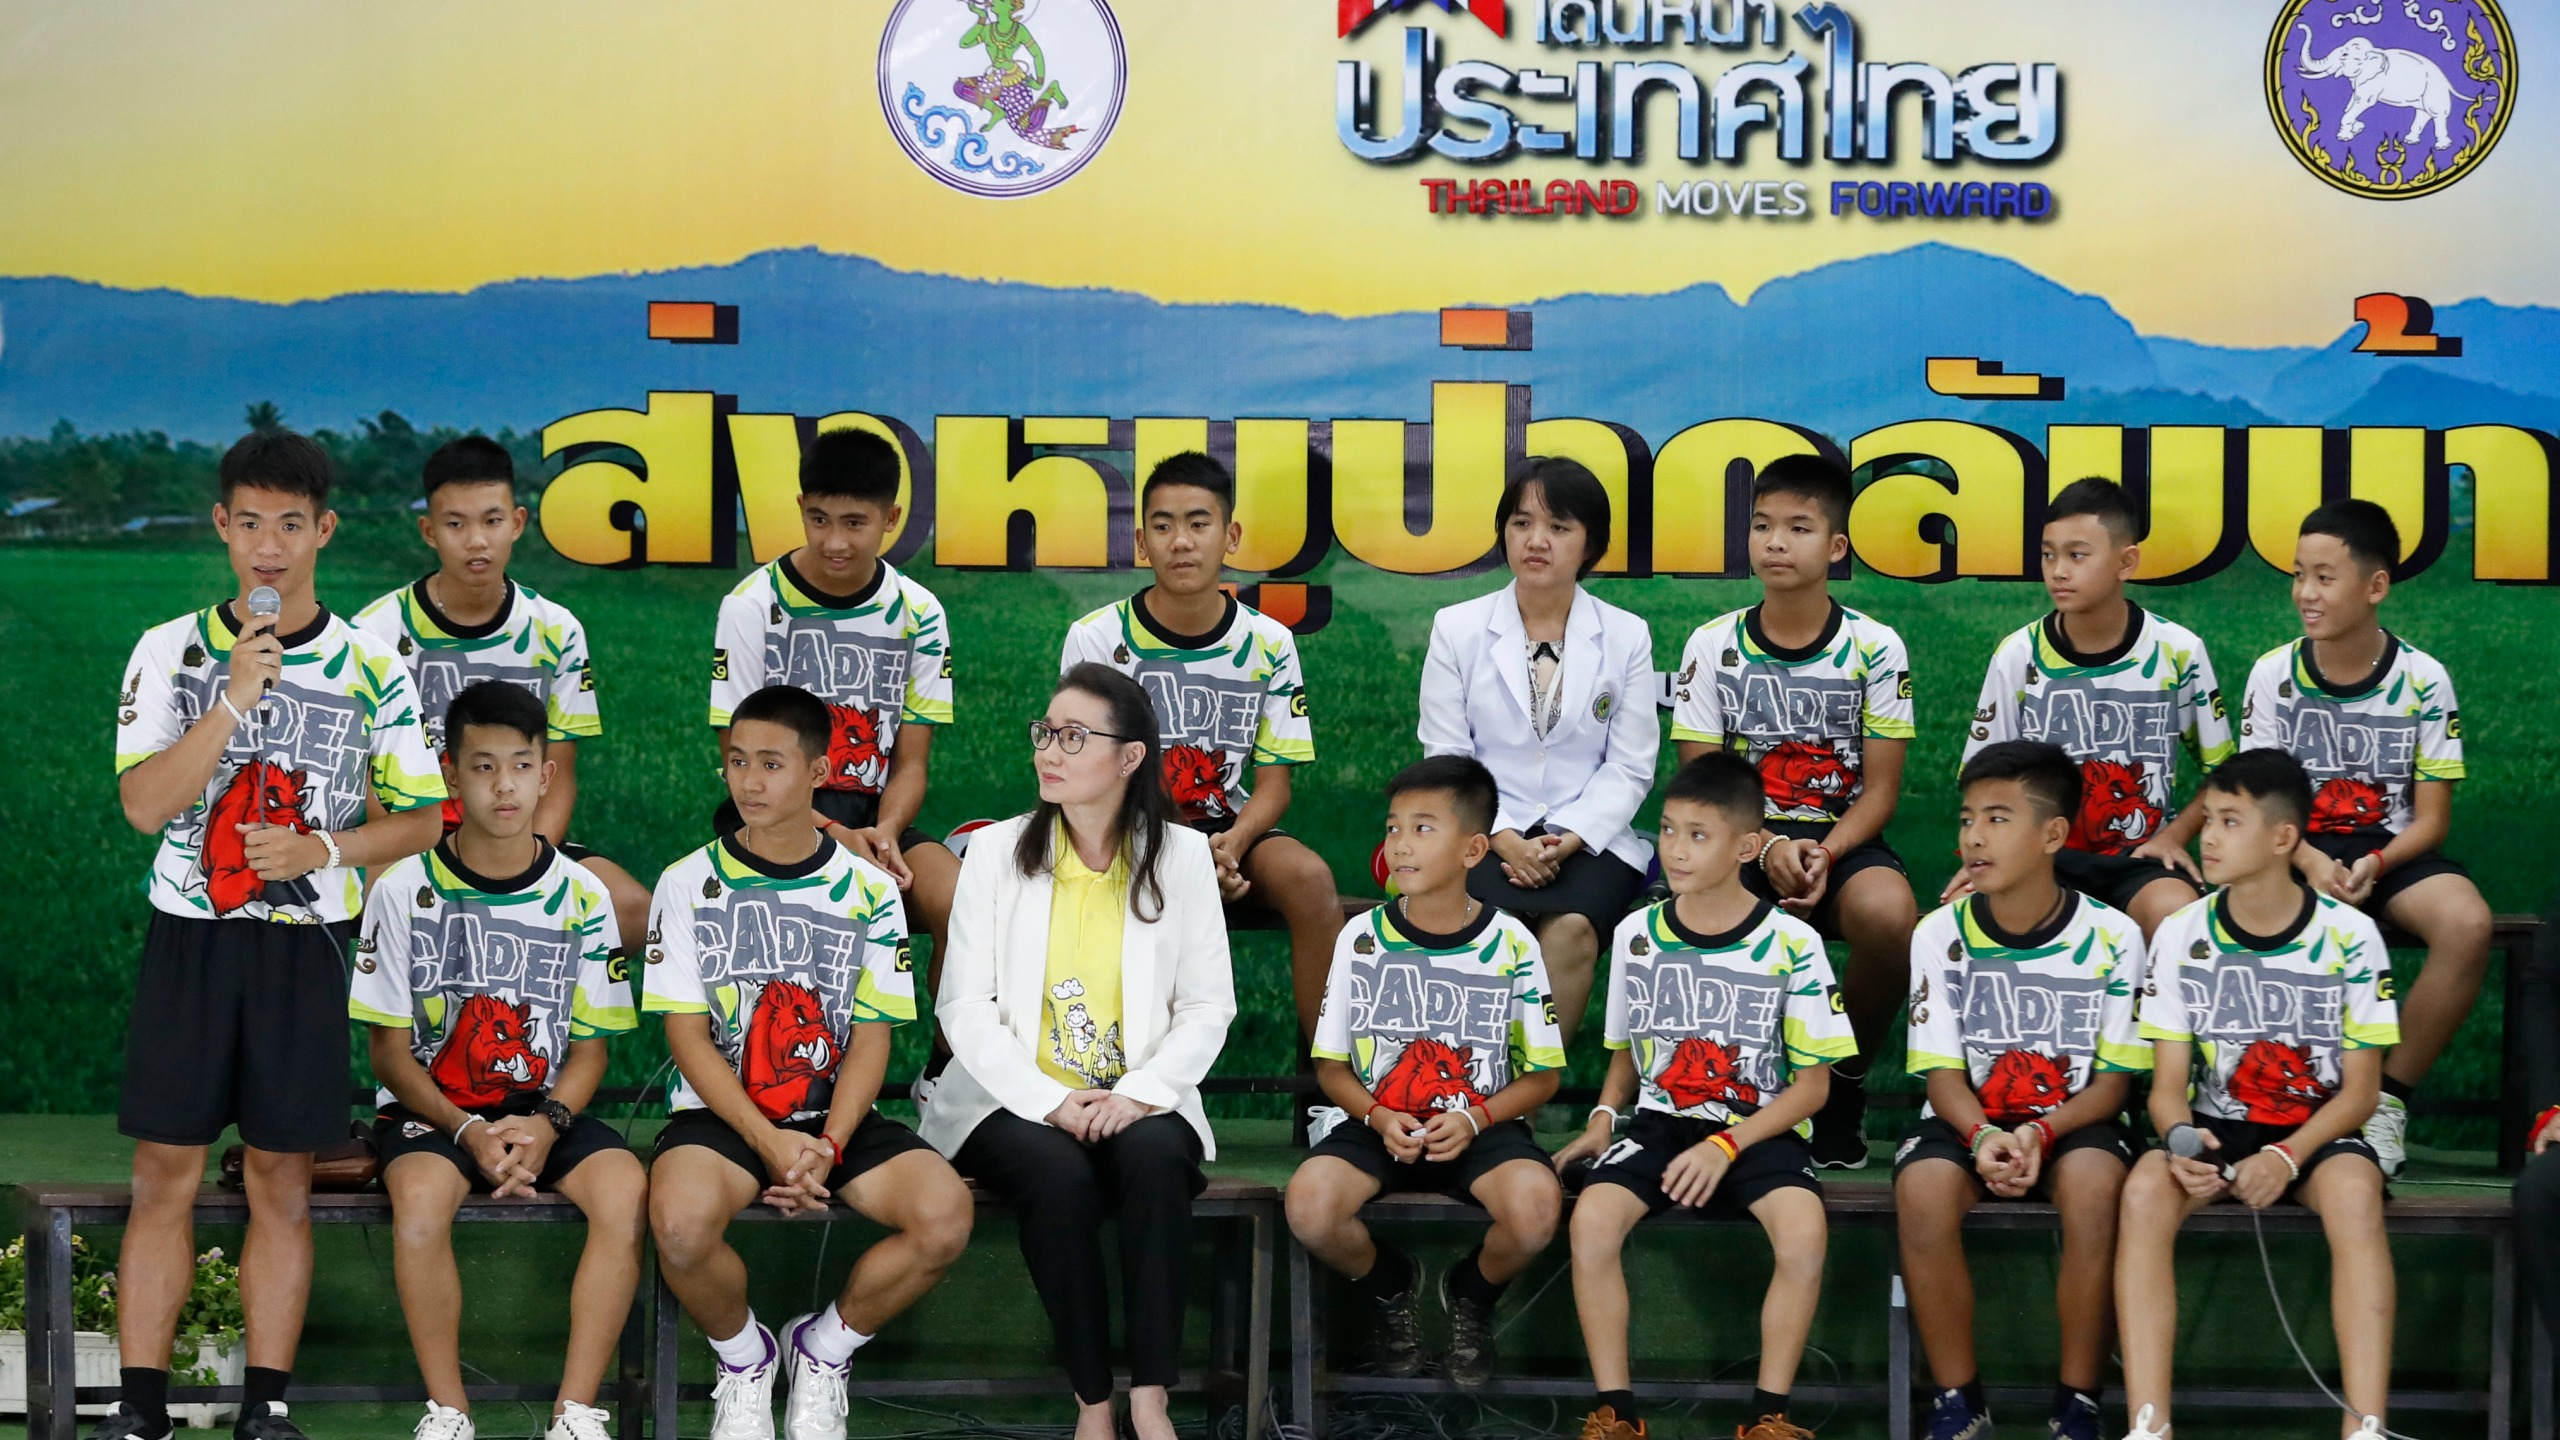 Thailand soccer team arrives at press conference.